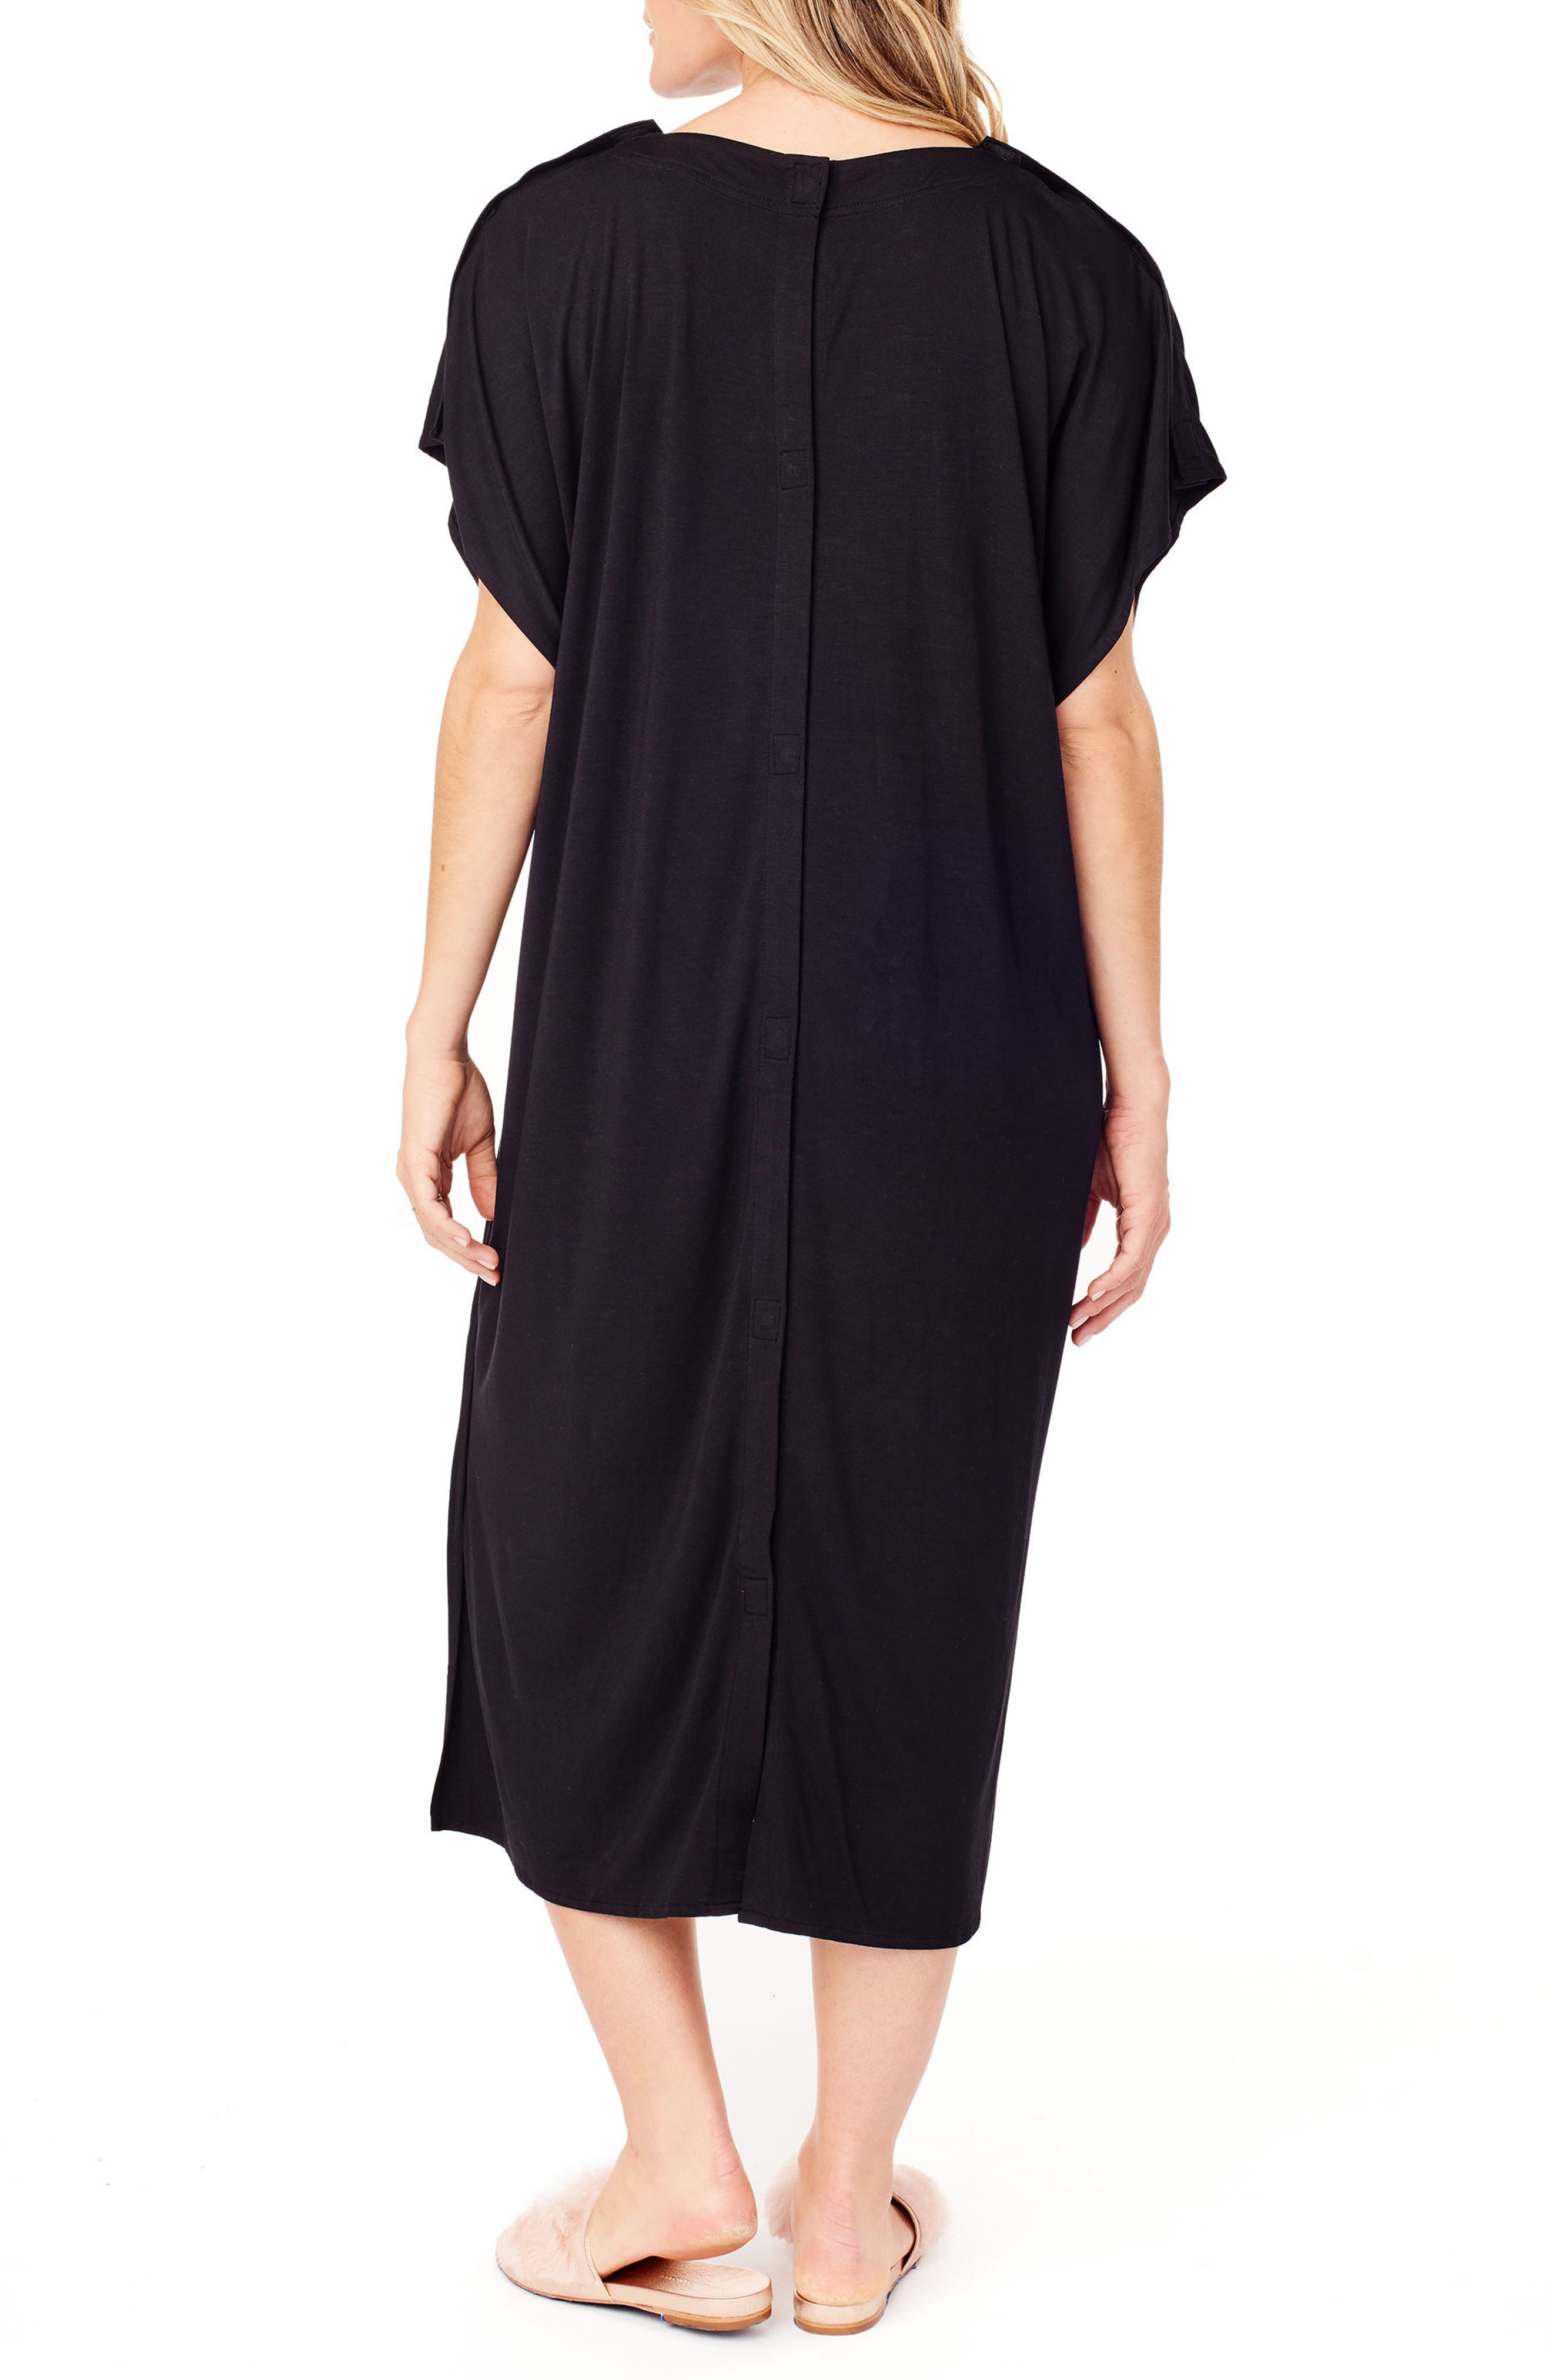 x James Fox & Co. Maternity/Nursing Hospital Gown,                             Alternate thumbnail 2, color,                             Jet Black